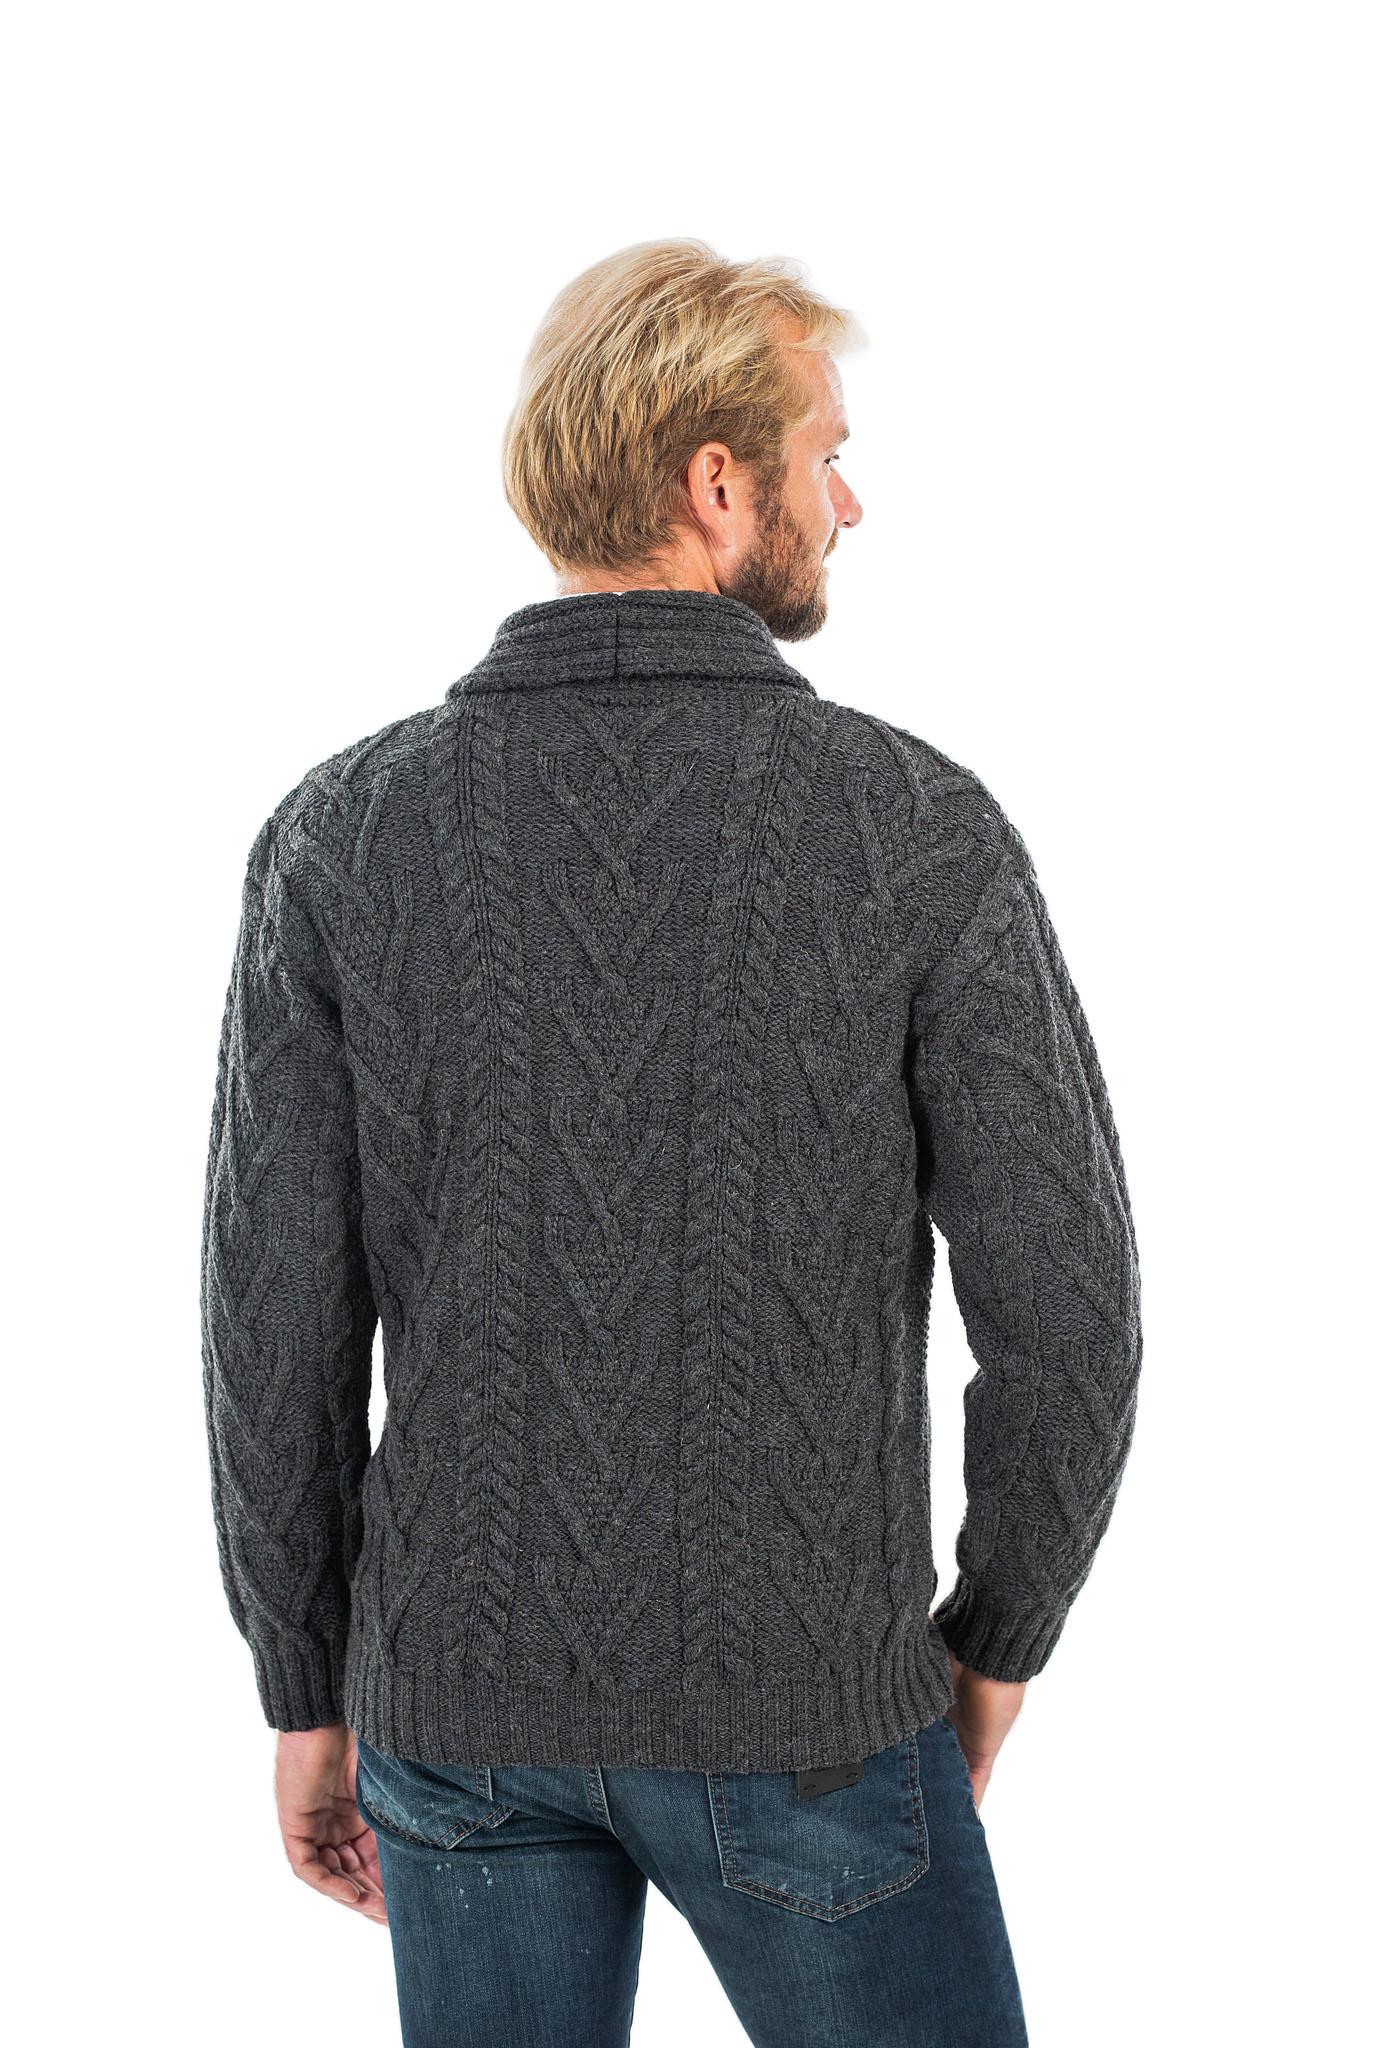 SAOL-Mens-Irish-Merino-Wool-Cardigan-Shawl-Collar-Front-Pockets-Aran-Cable-Knit thumbnail 35